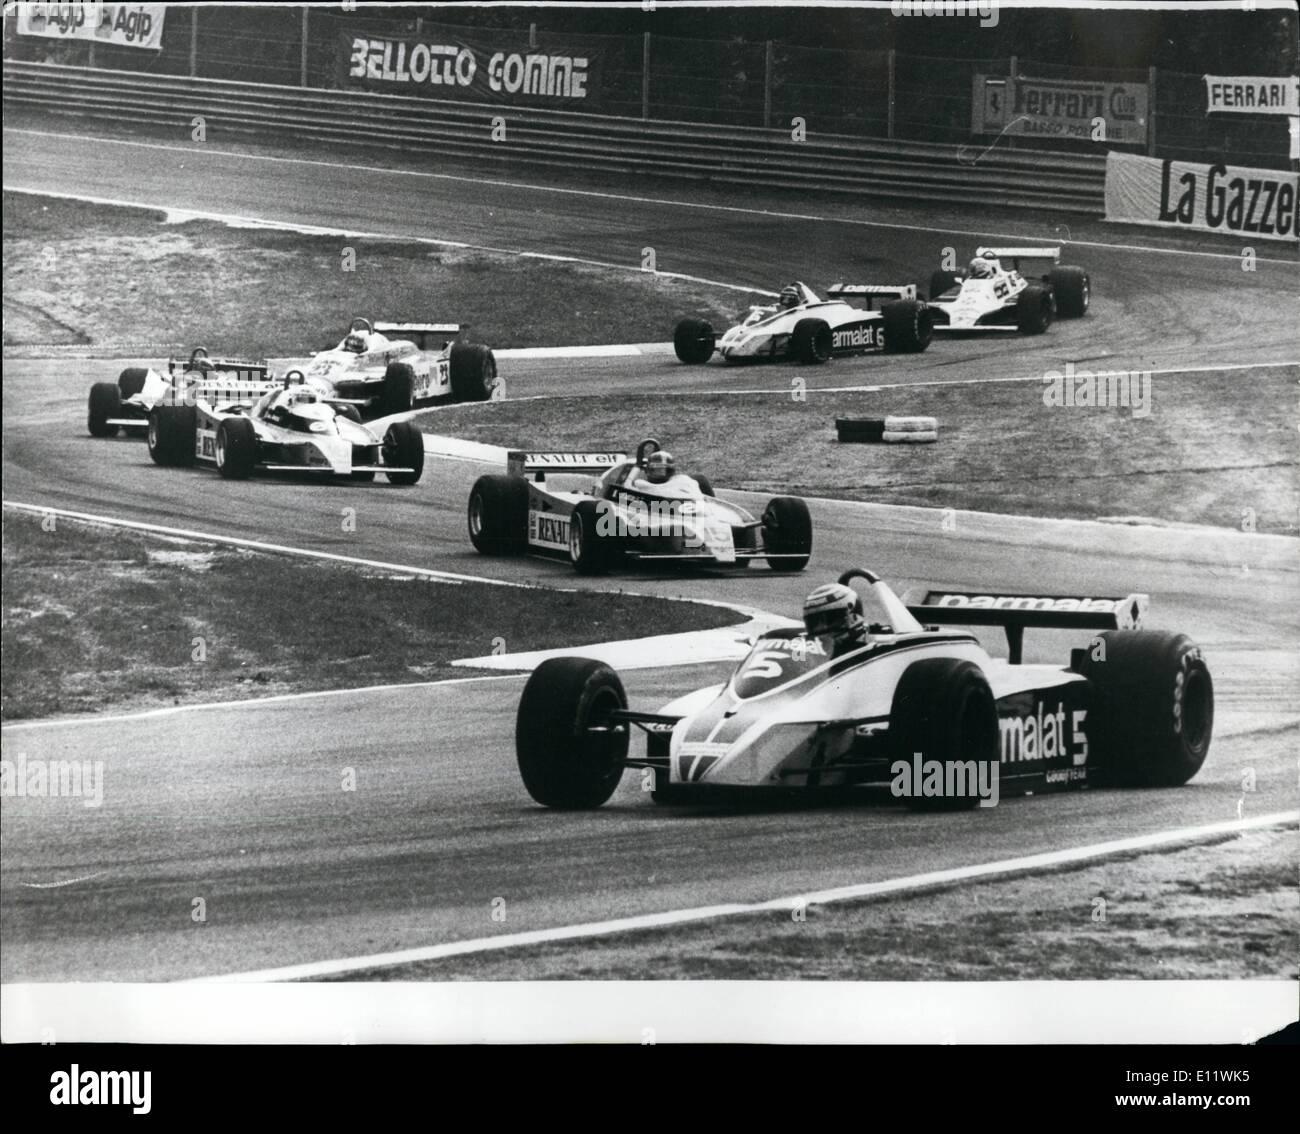 1980 grand prix high resolution stock photography and images alamy https www alamy com sep 09 1980 brazilian piquet wins italian grand prix brazilian driver image69498217 html